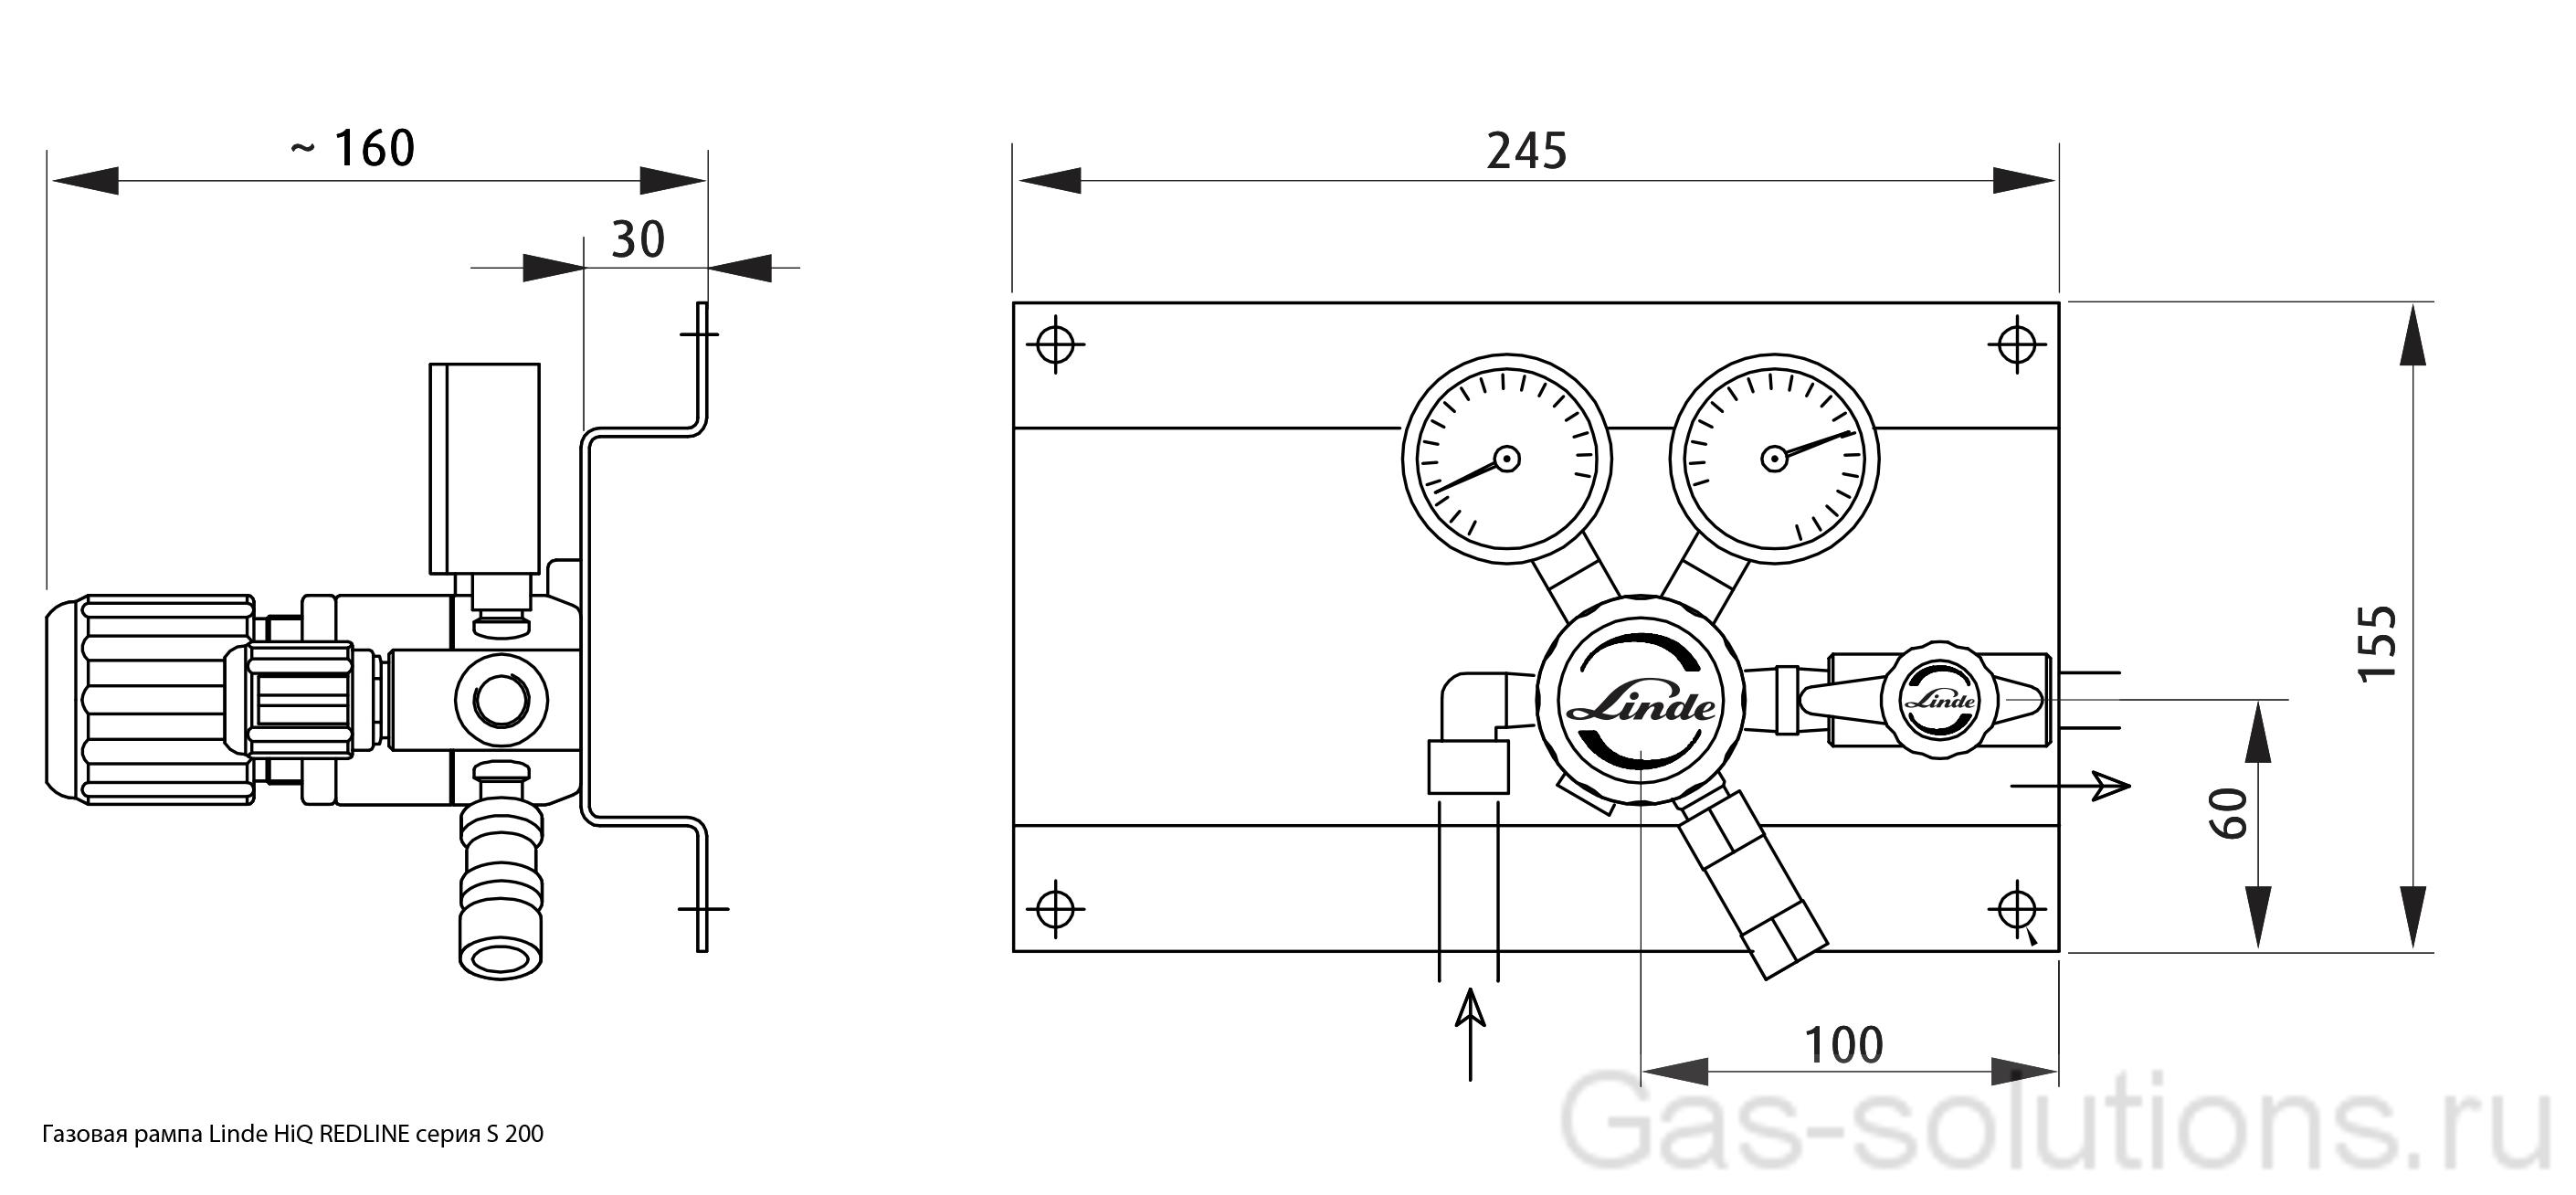 Газовая рампа Linde HiQ REDLINE серия S 200_чертеж